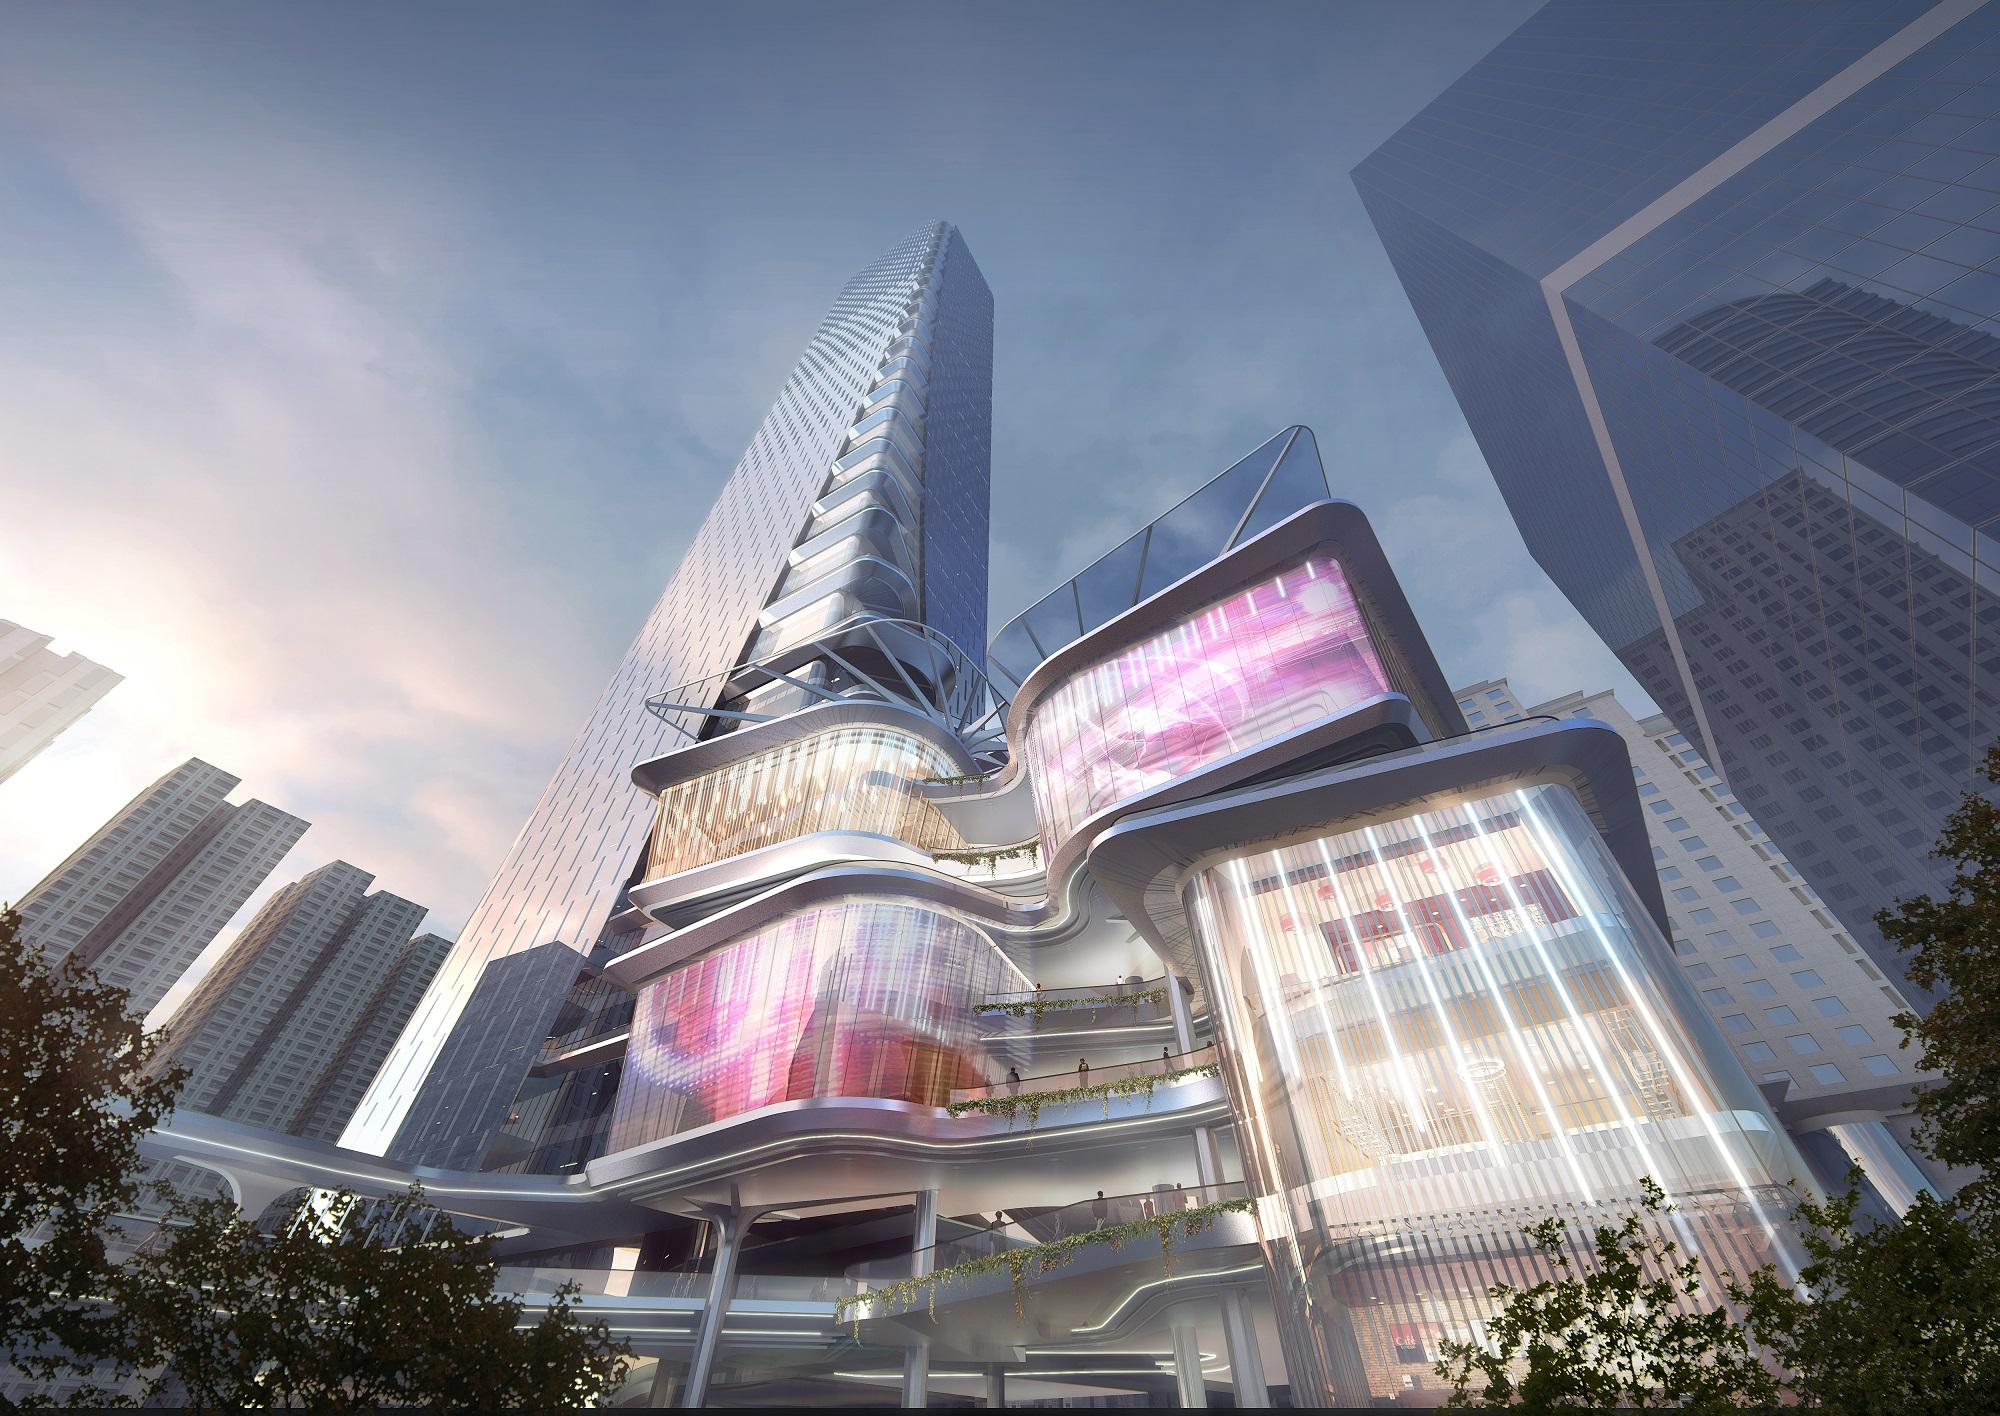 Shenzhen Luohu Friendship Trading Centre Architect